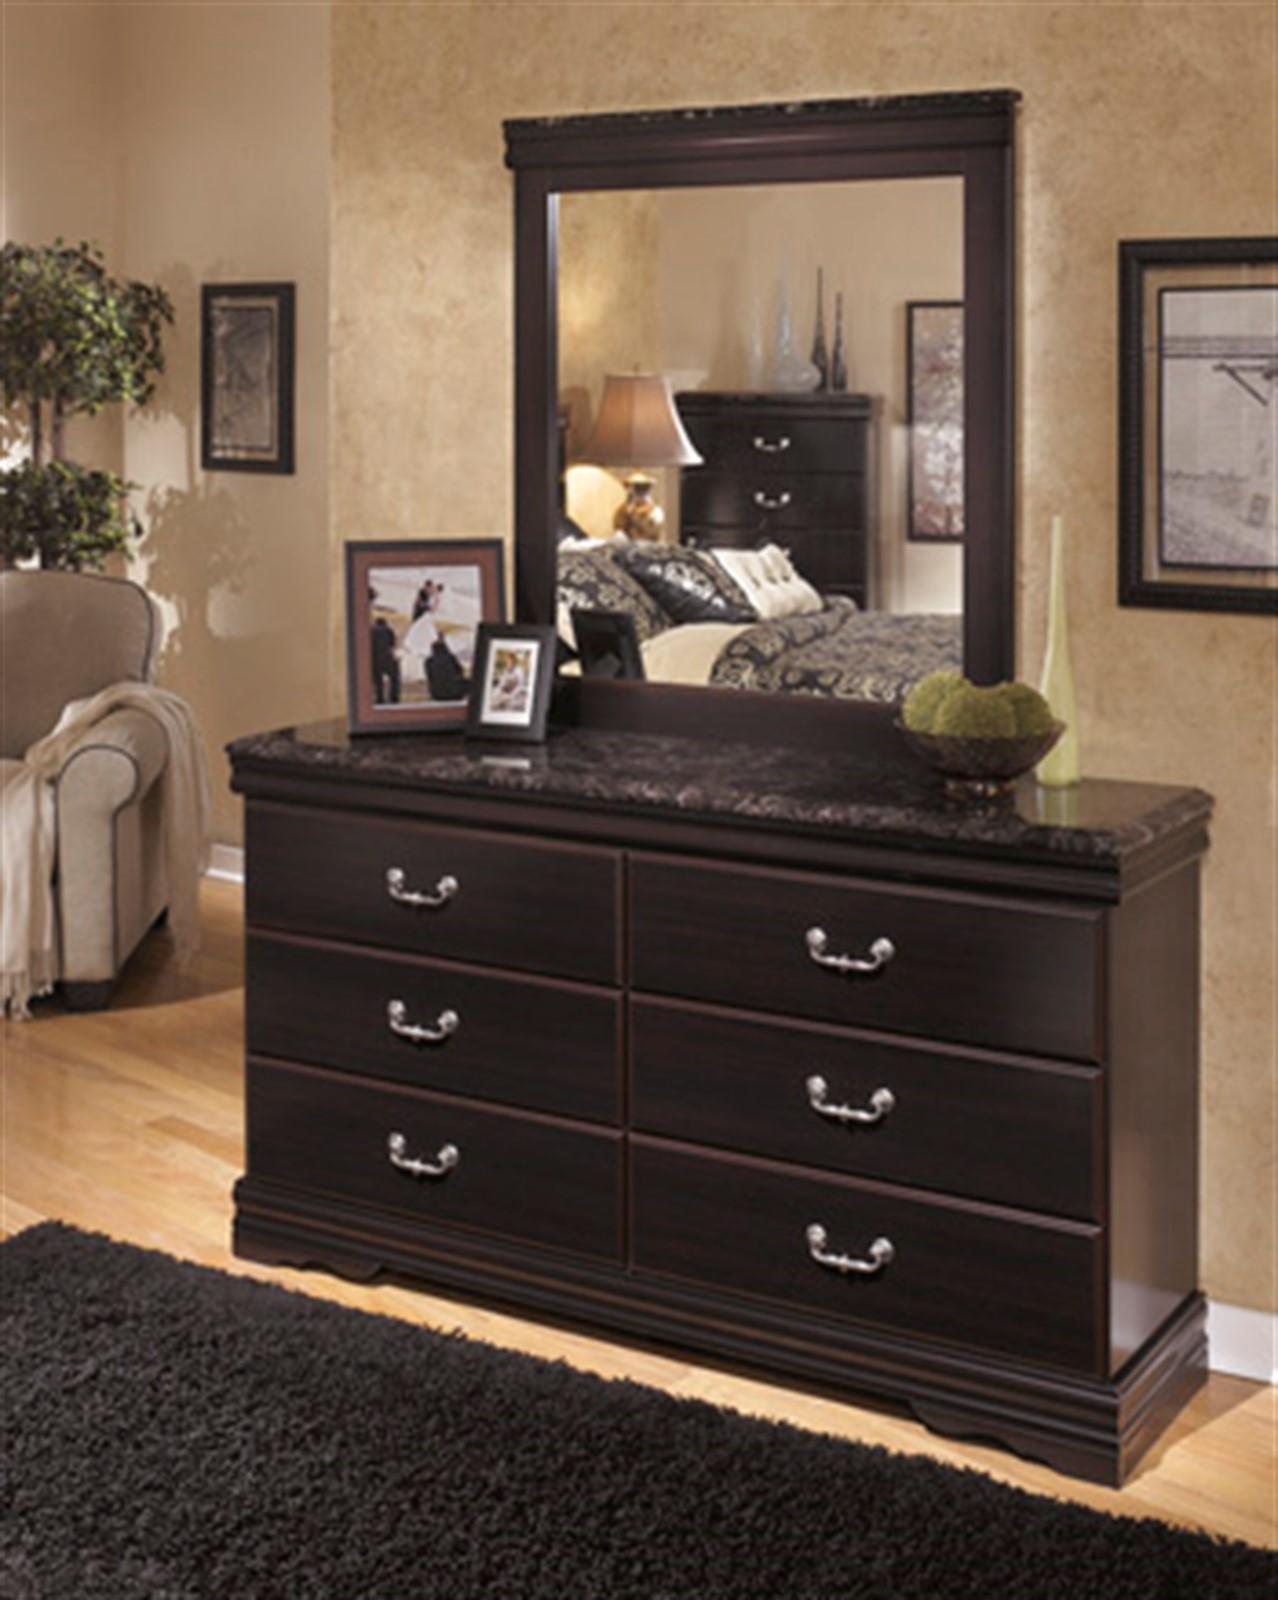 Esmarelda Dresser and Mirror Set - Dark Merlot